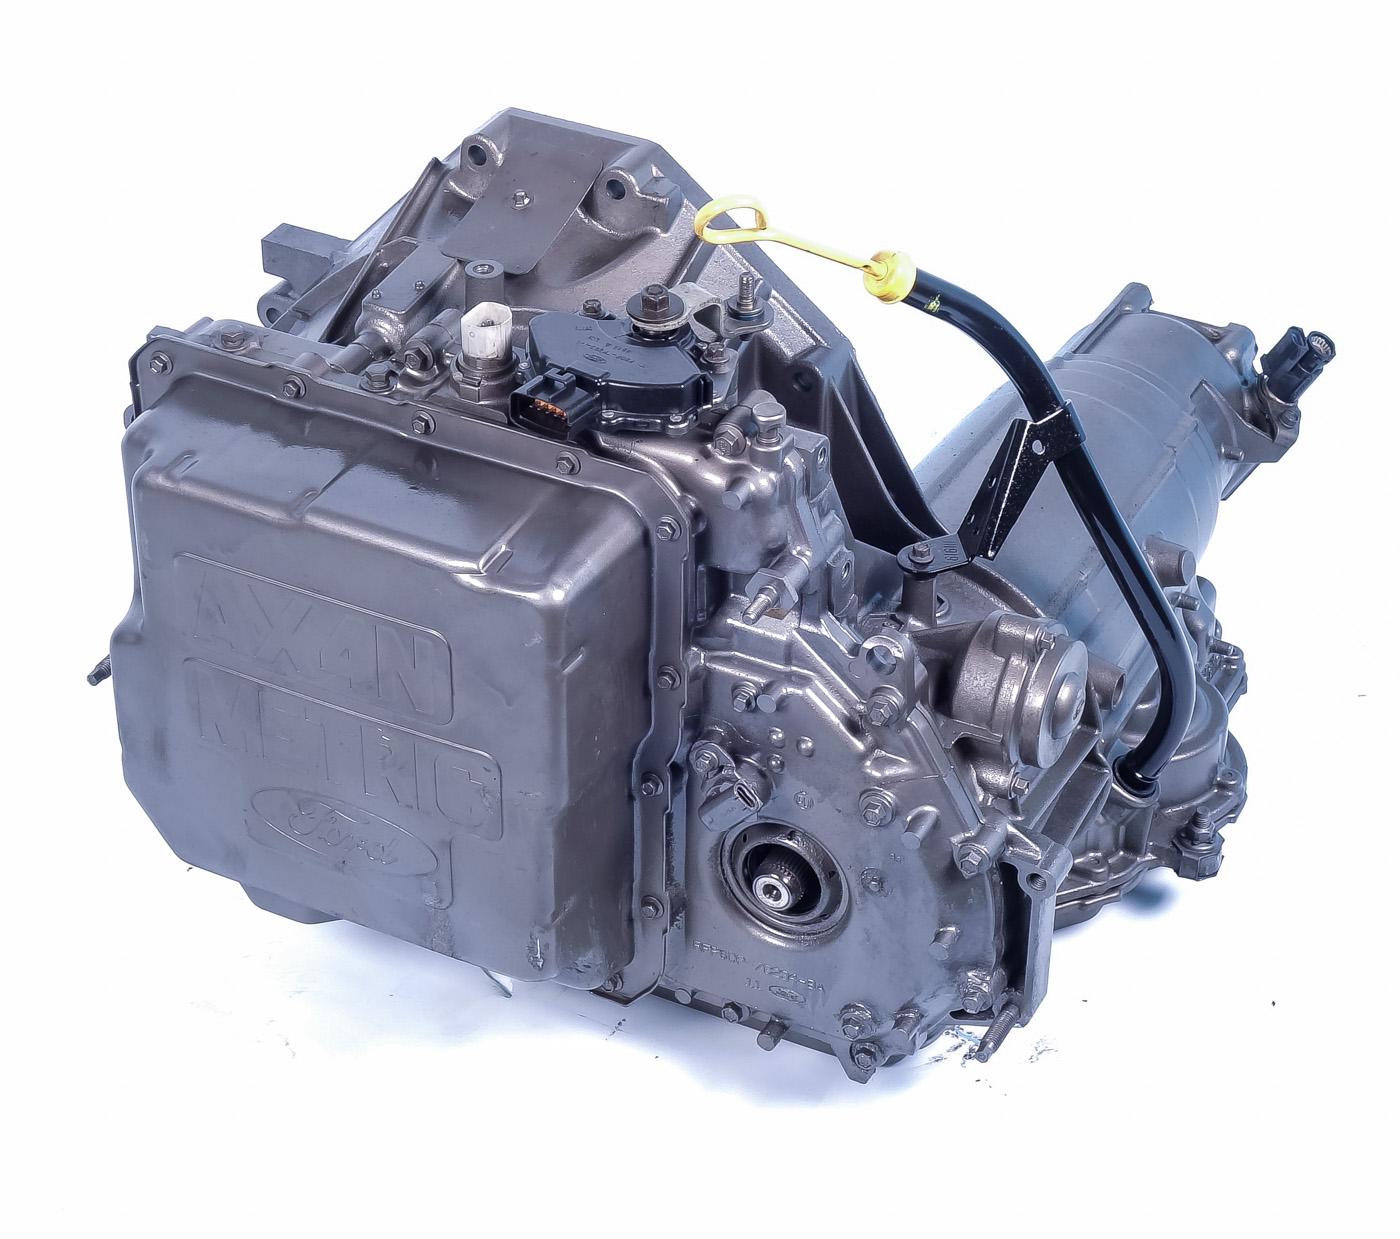 2011 ford taurus engine diagram